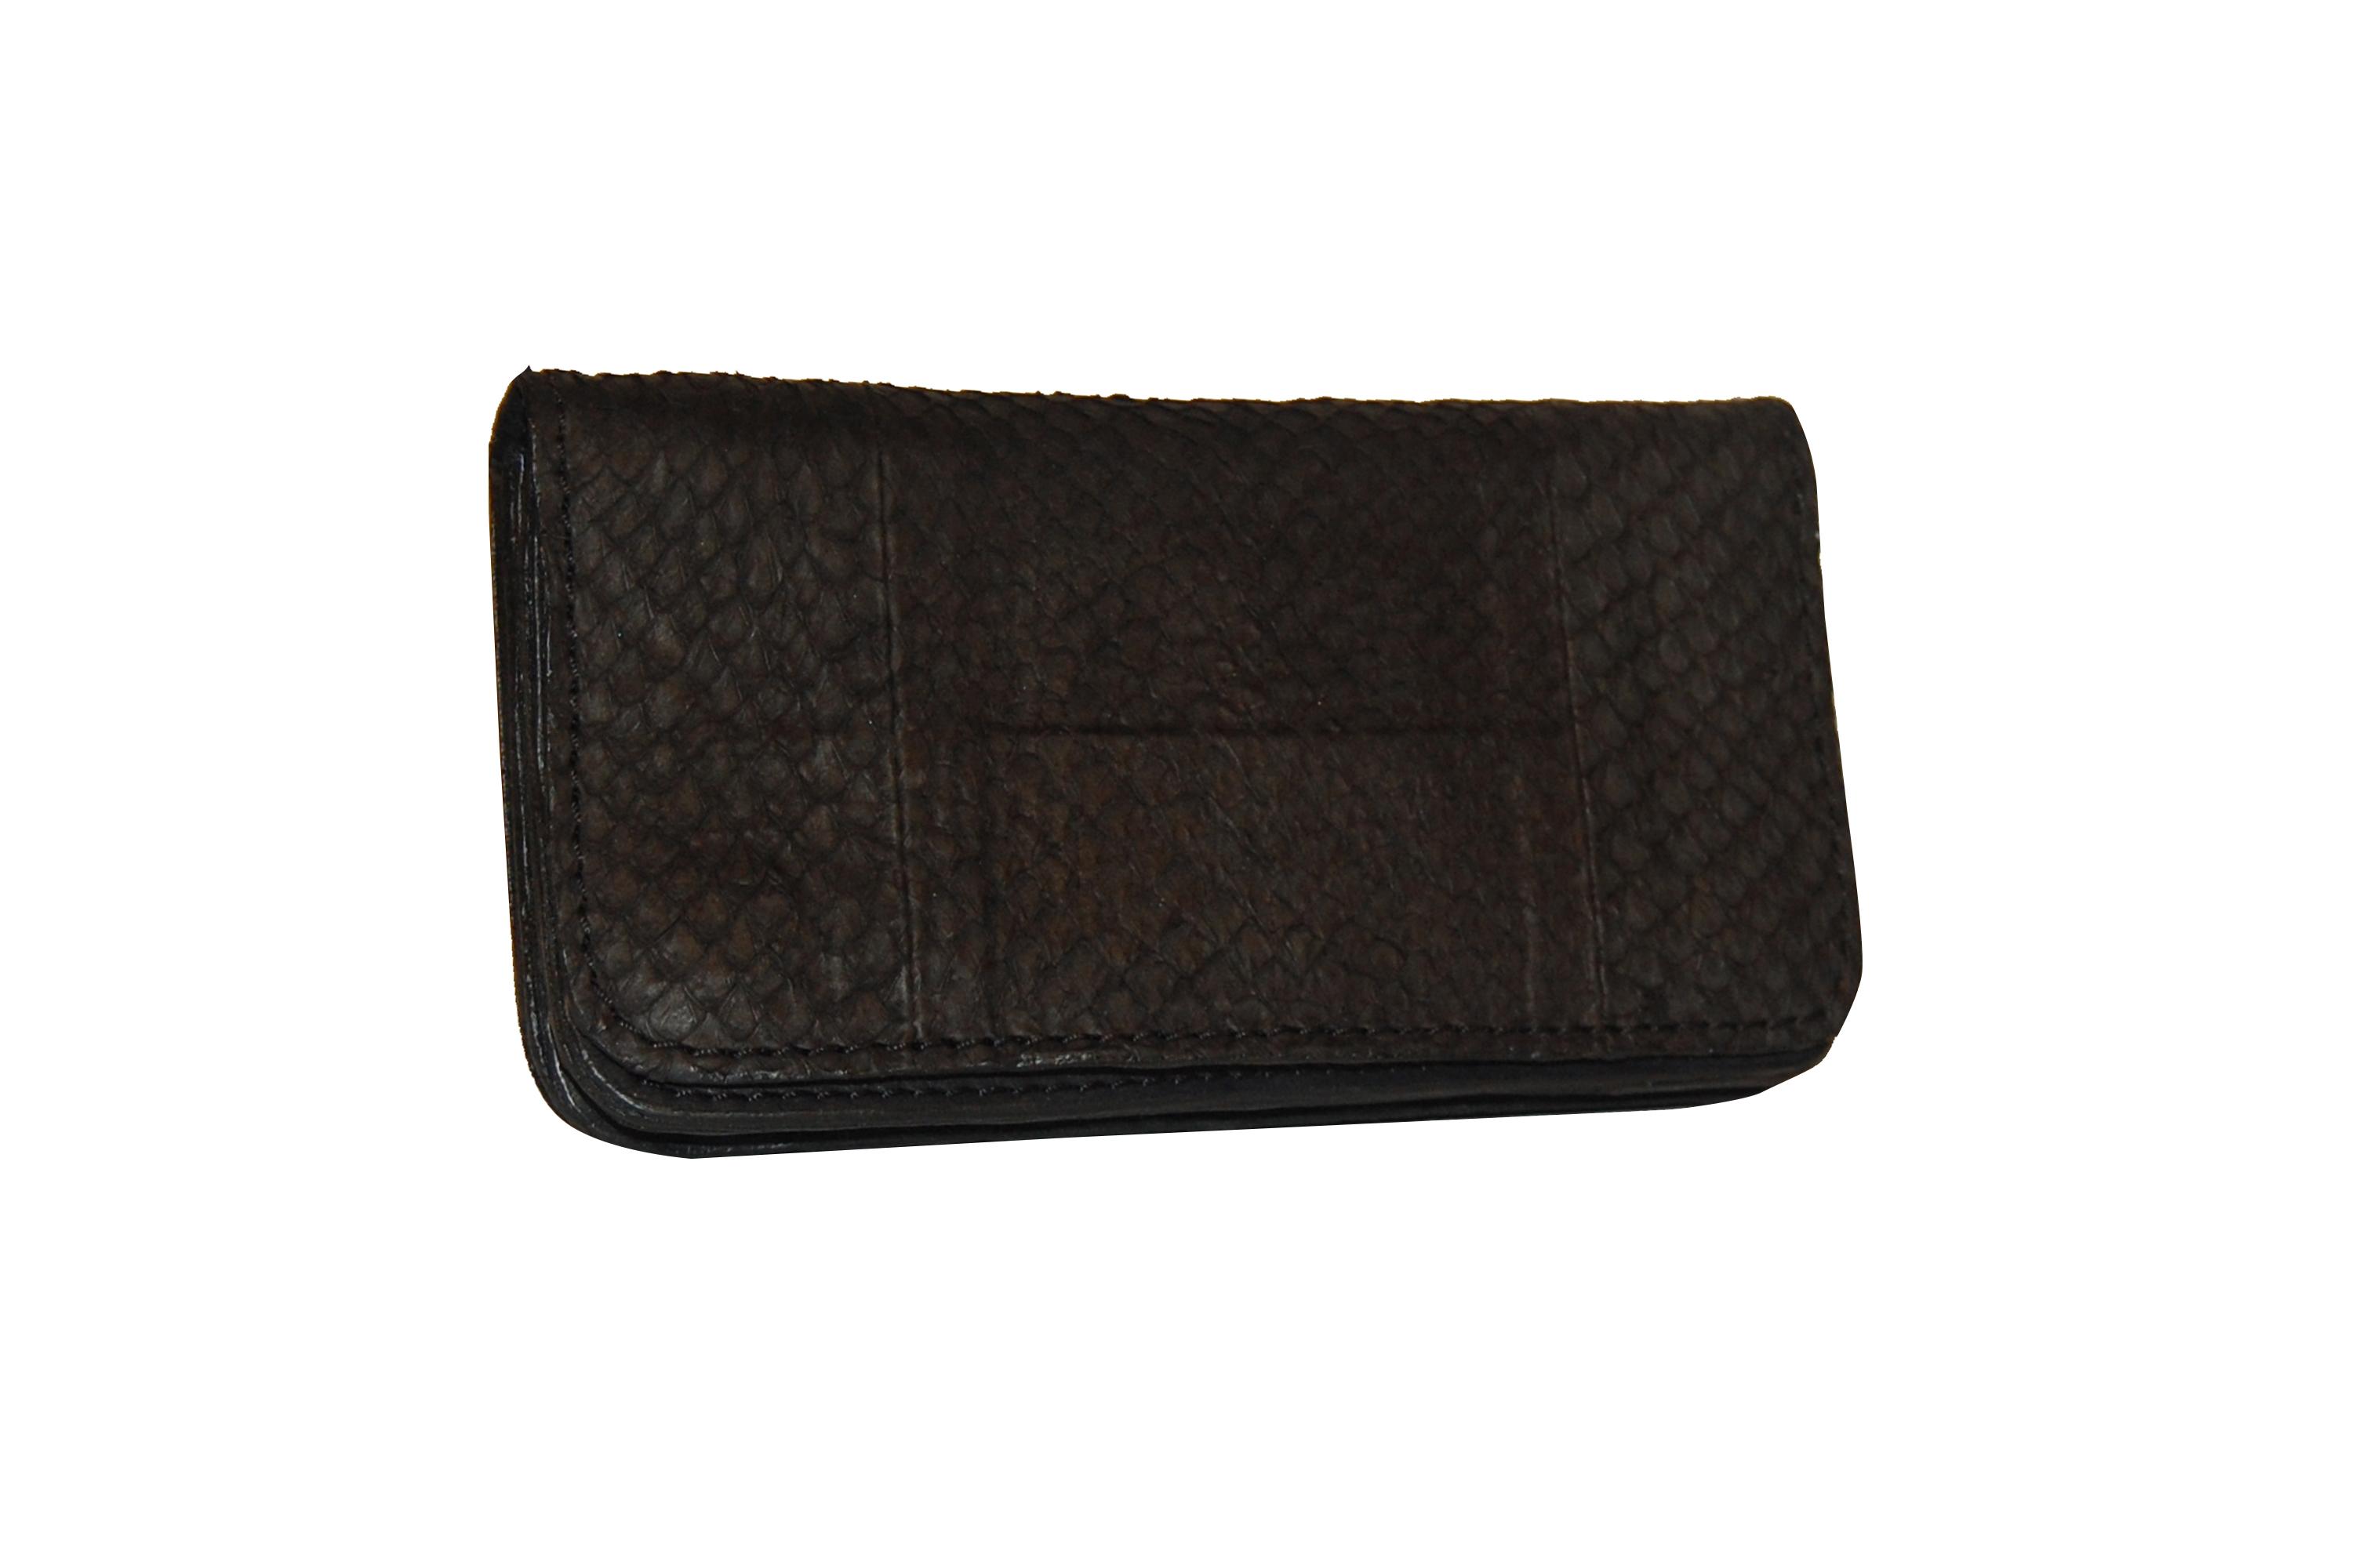 Mahiout Evo wallet in salmon skin